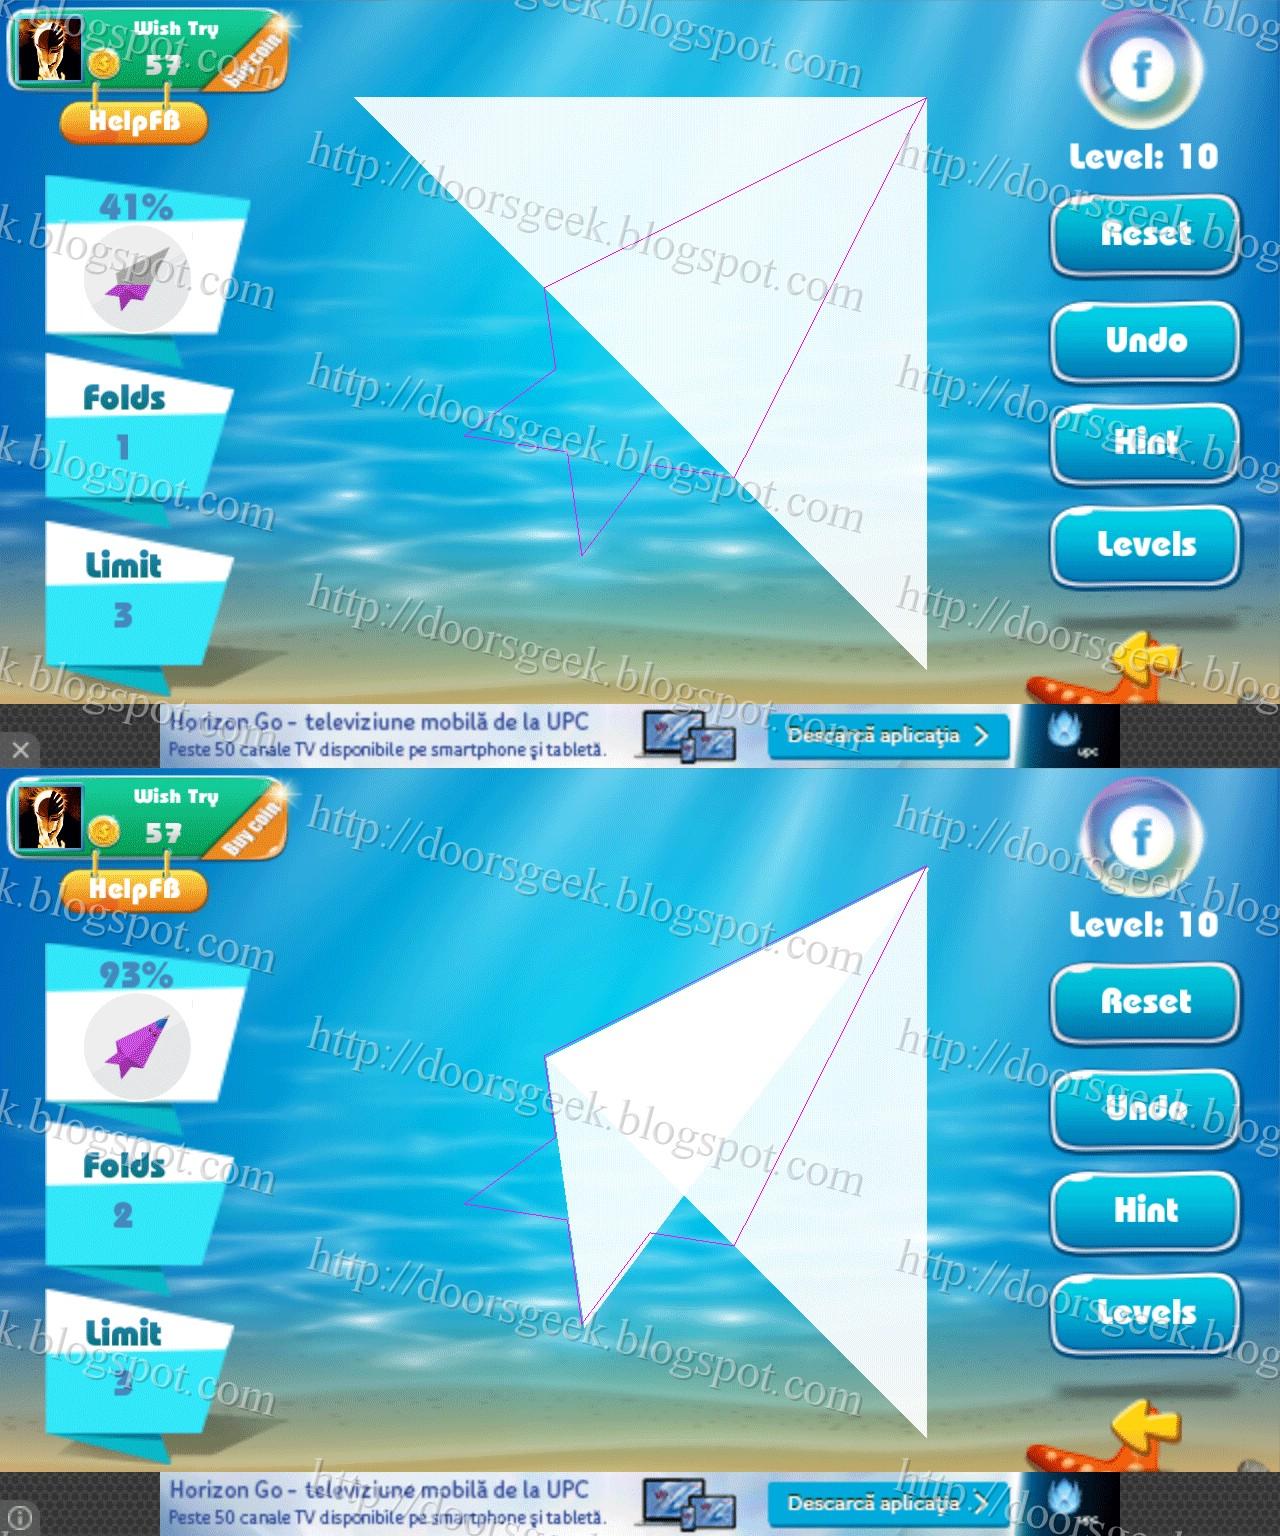 Paper Folding - Origami Level 10 Solution ~ Doors Geek - photo#20